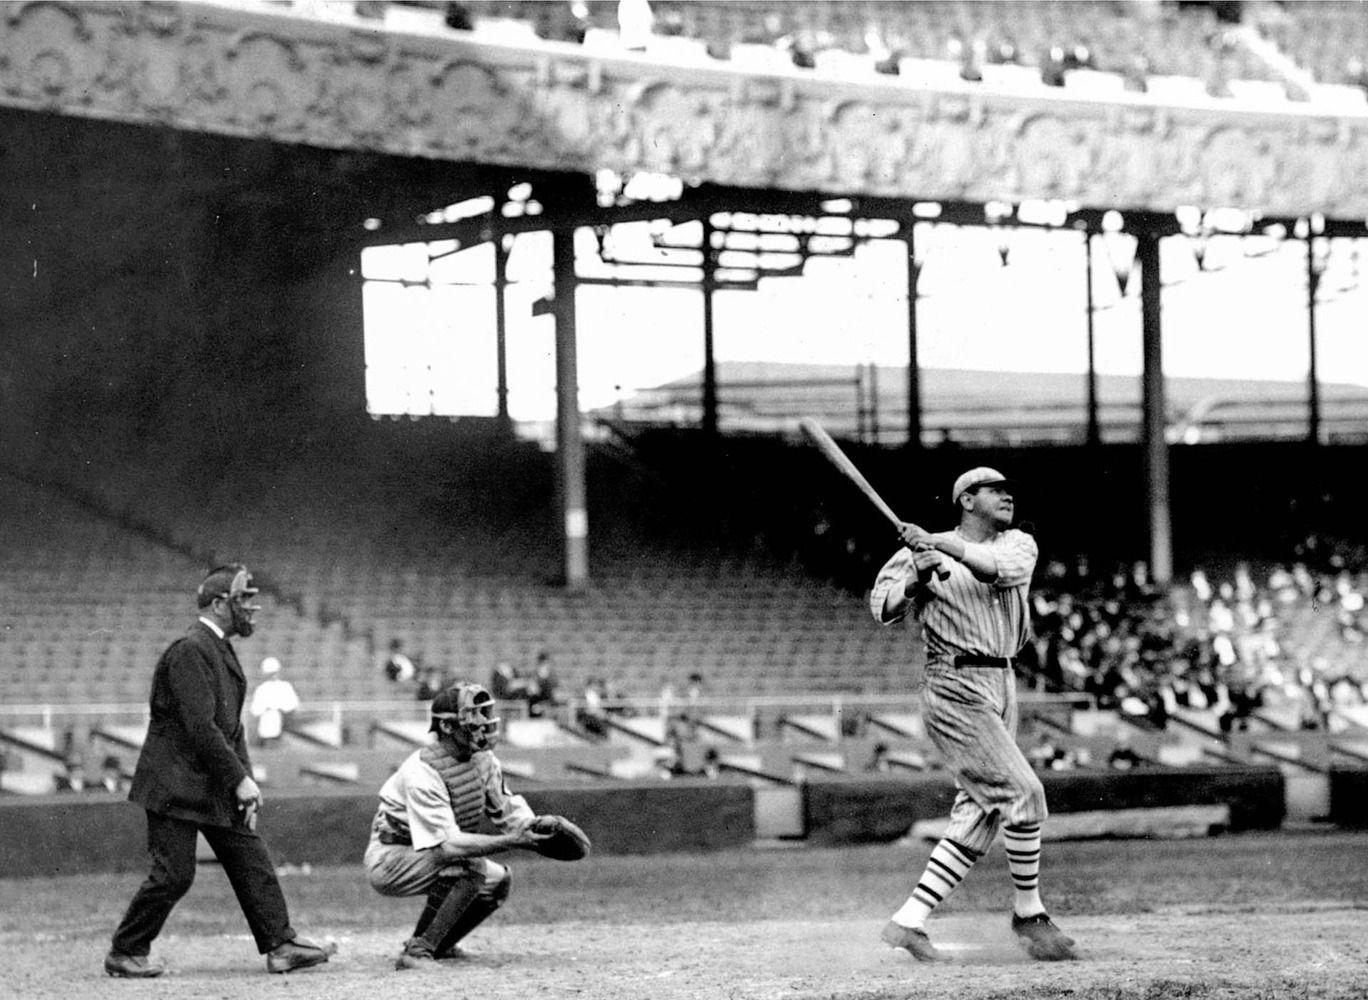 Sport Wallpaper Vintage: 28 Vintage Baseball Photos To Celebrate Opening Day